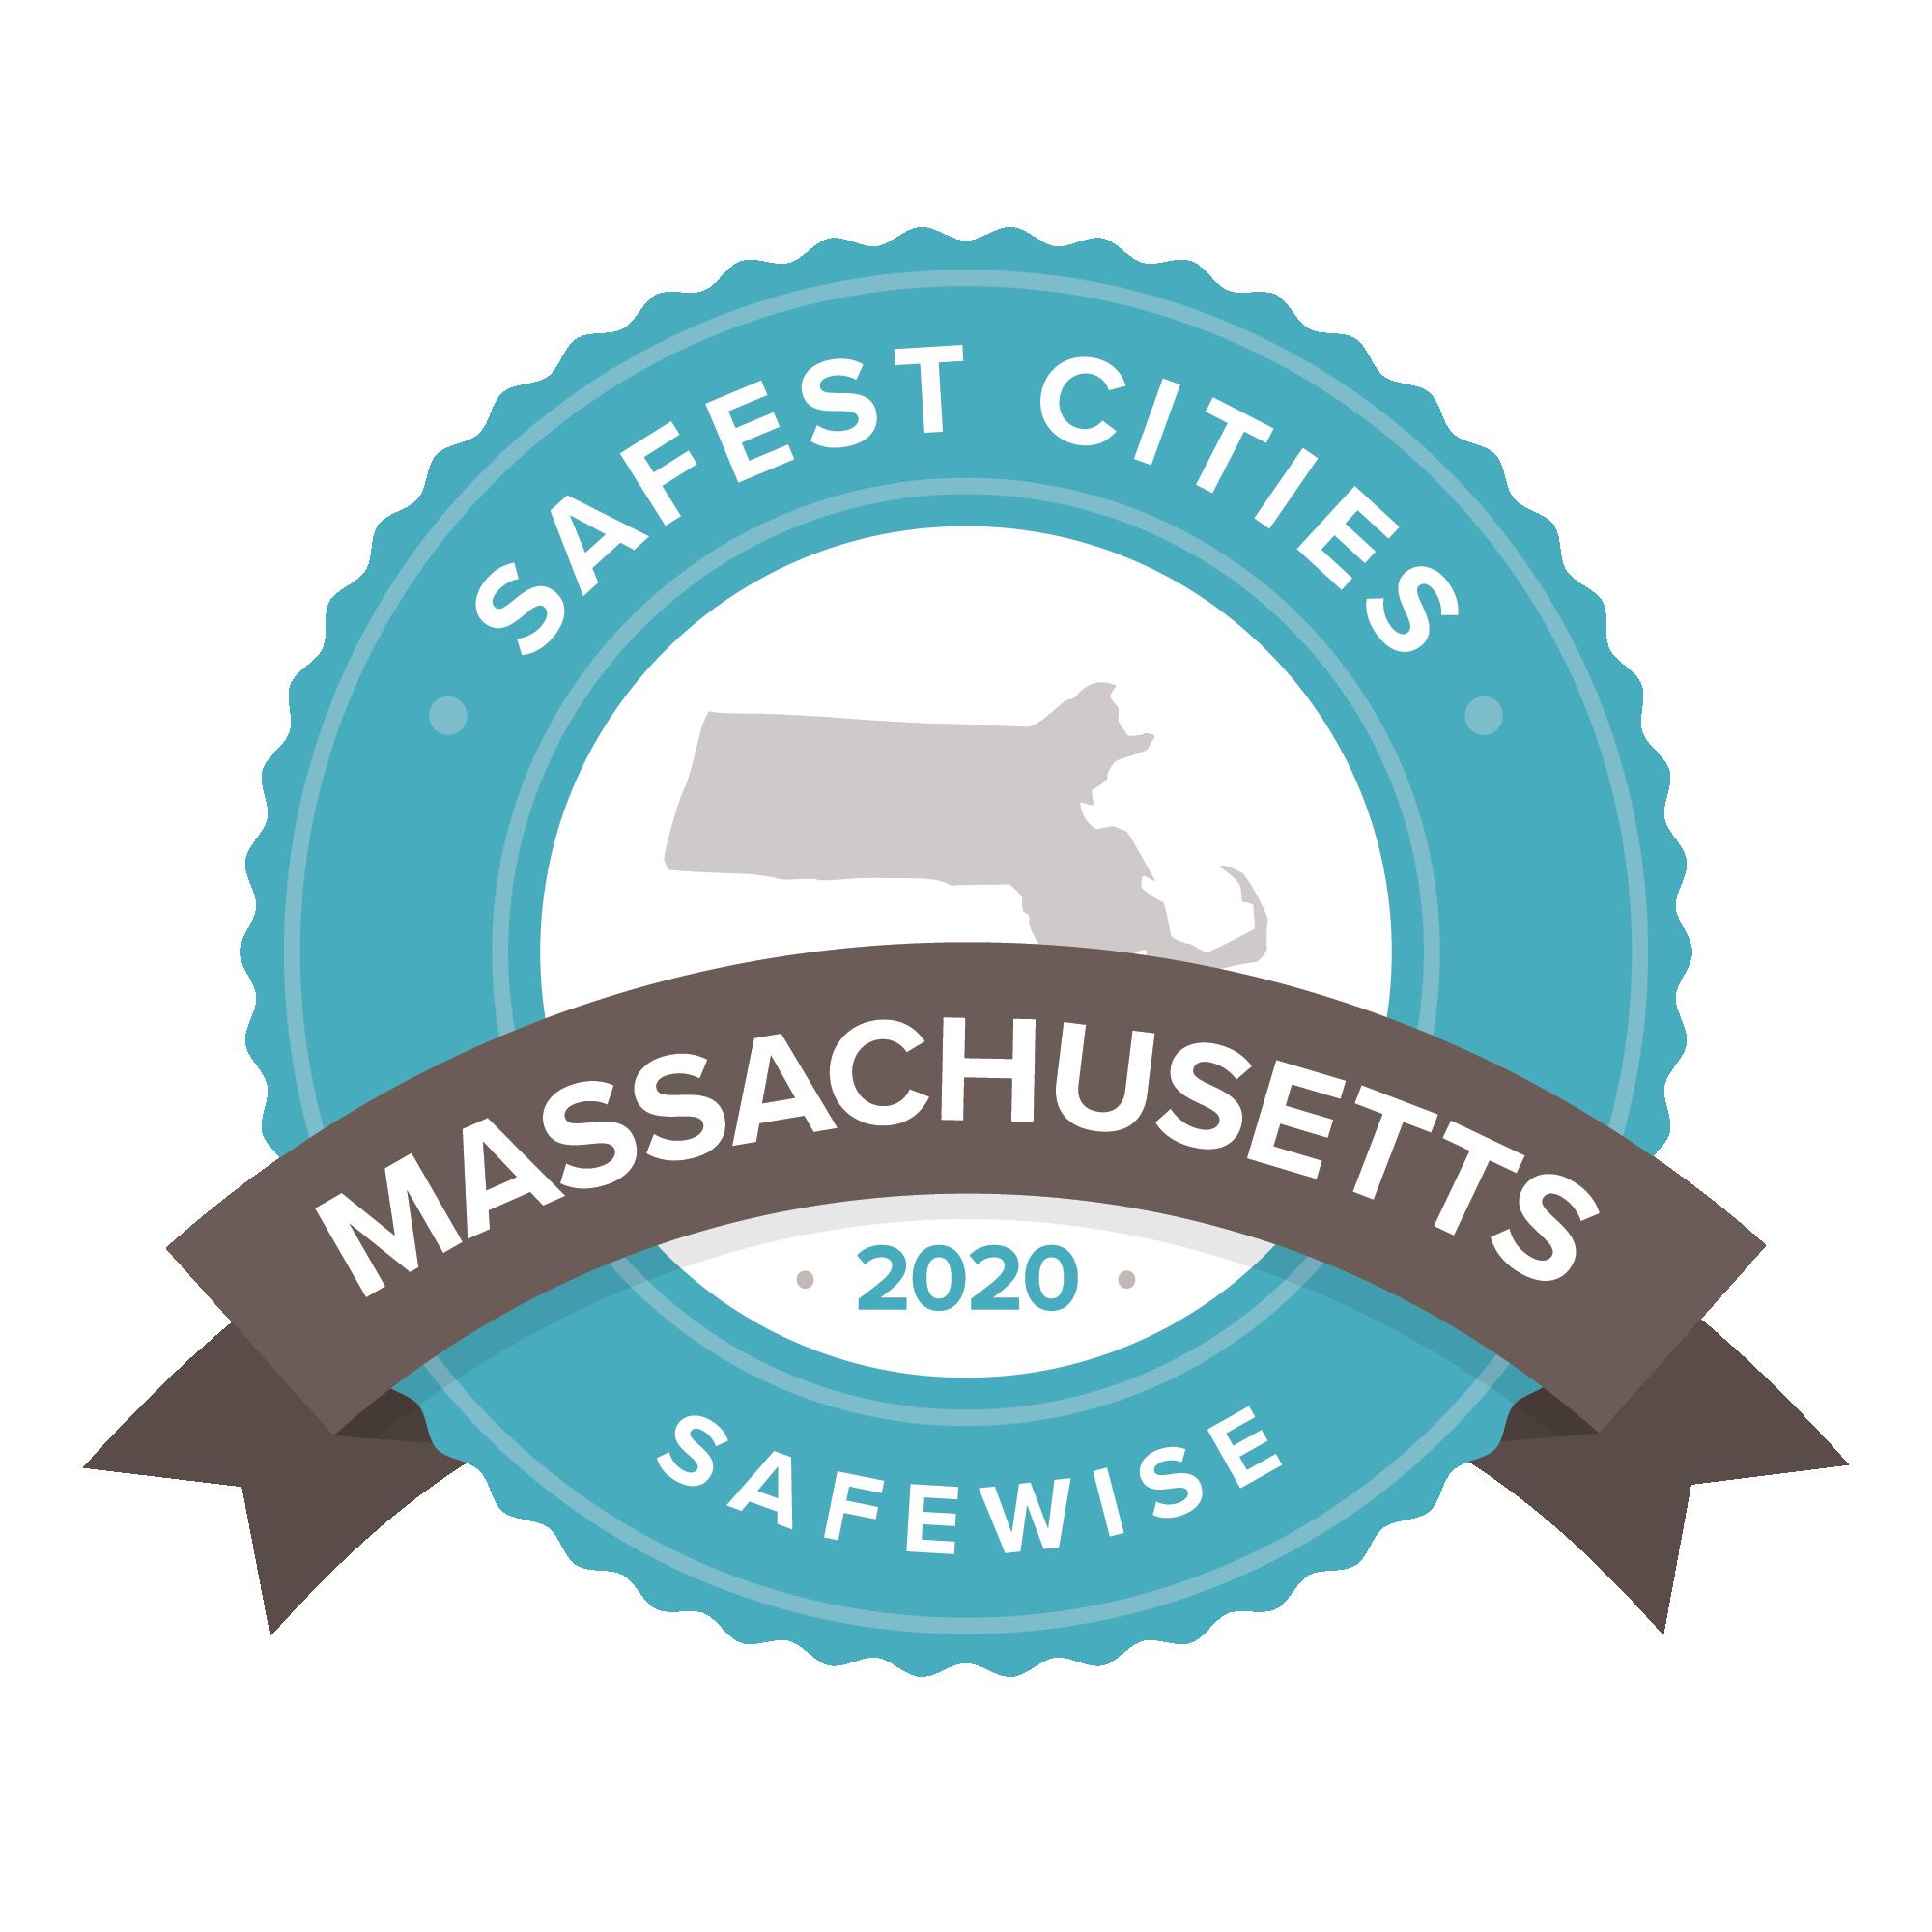 Massachusetts safest cities badge